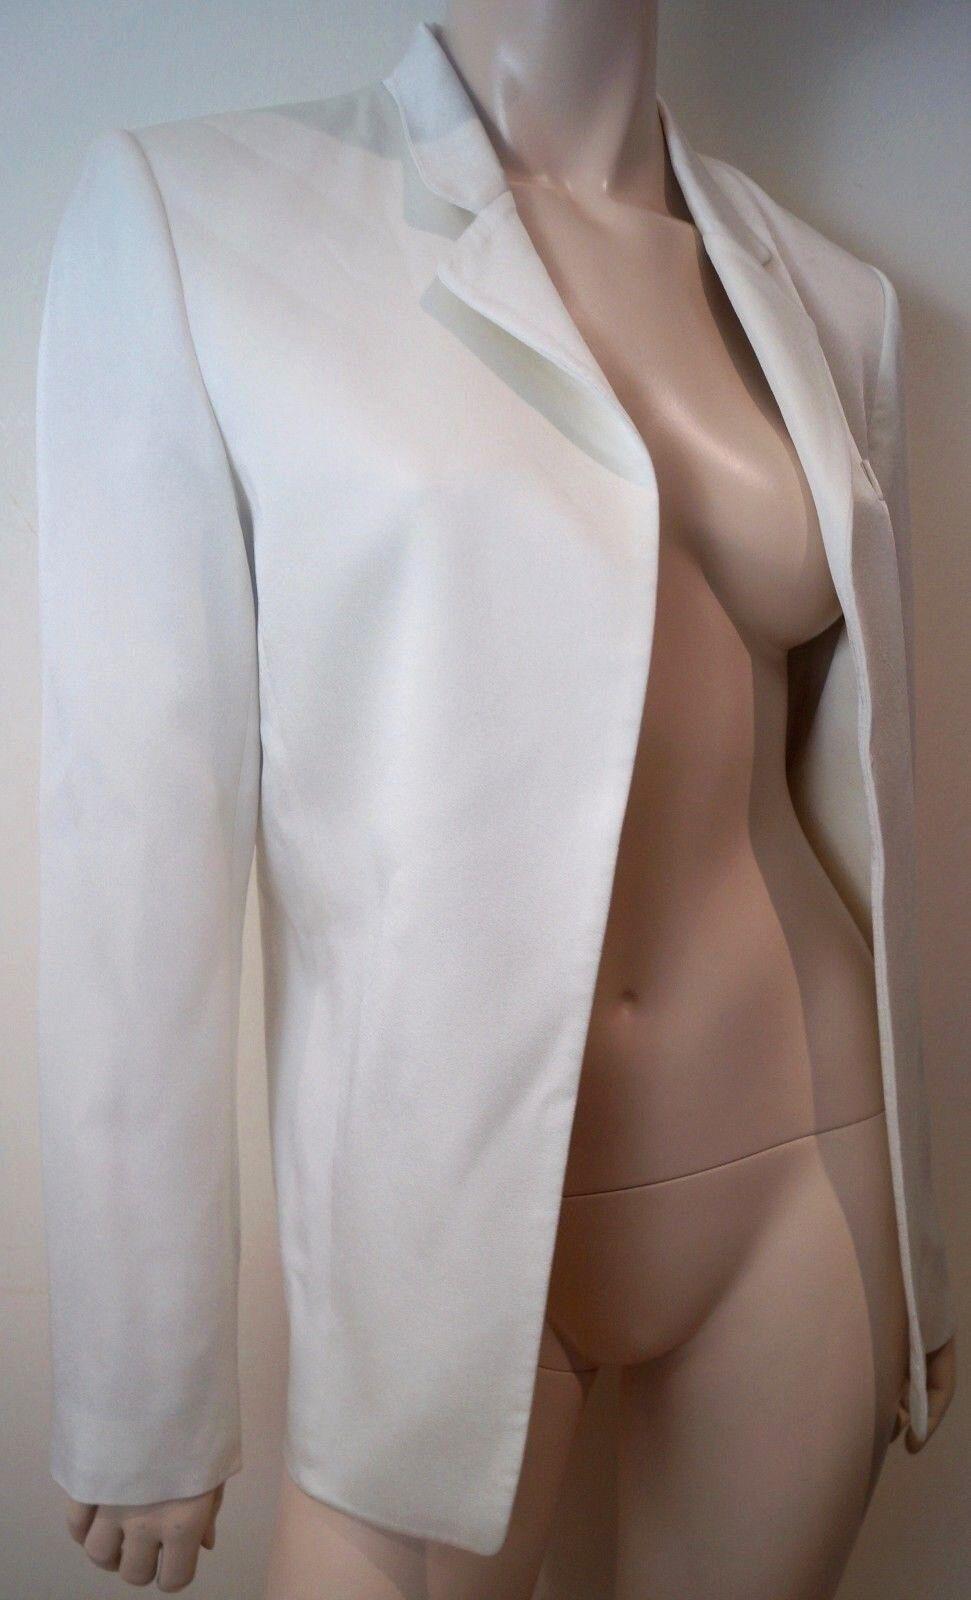 T BY ALEXANDER WANG Cream Open Front Lined Formal Evening Blazer jacke 6 UK10